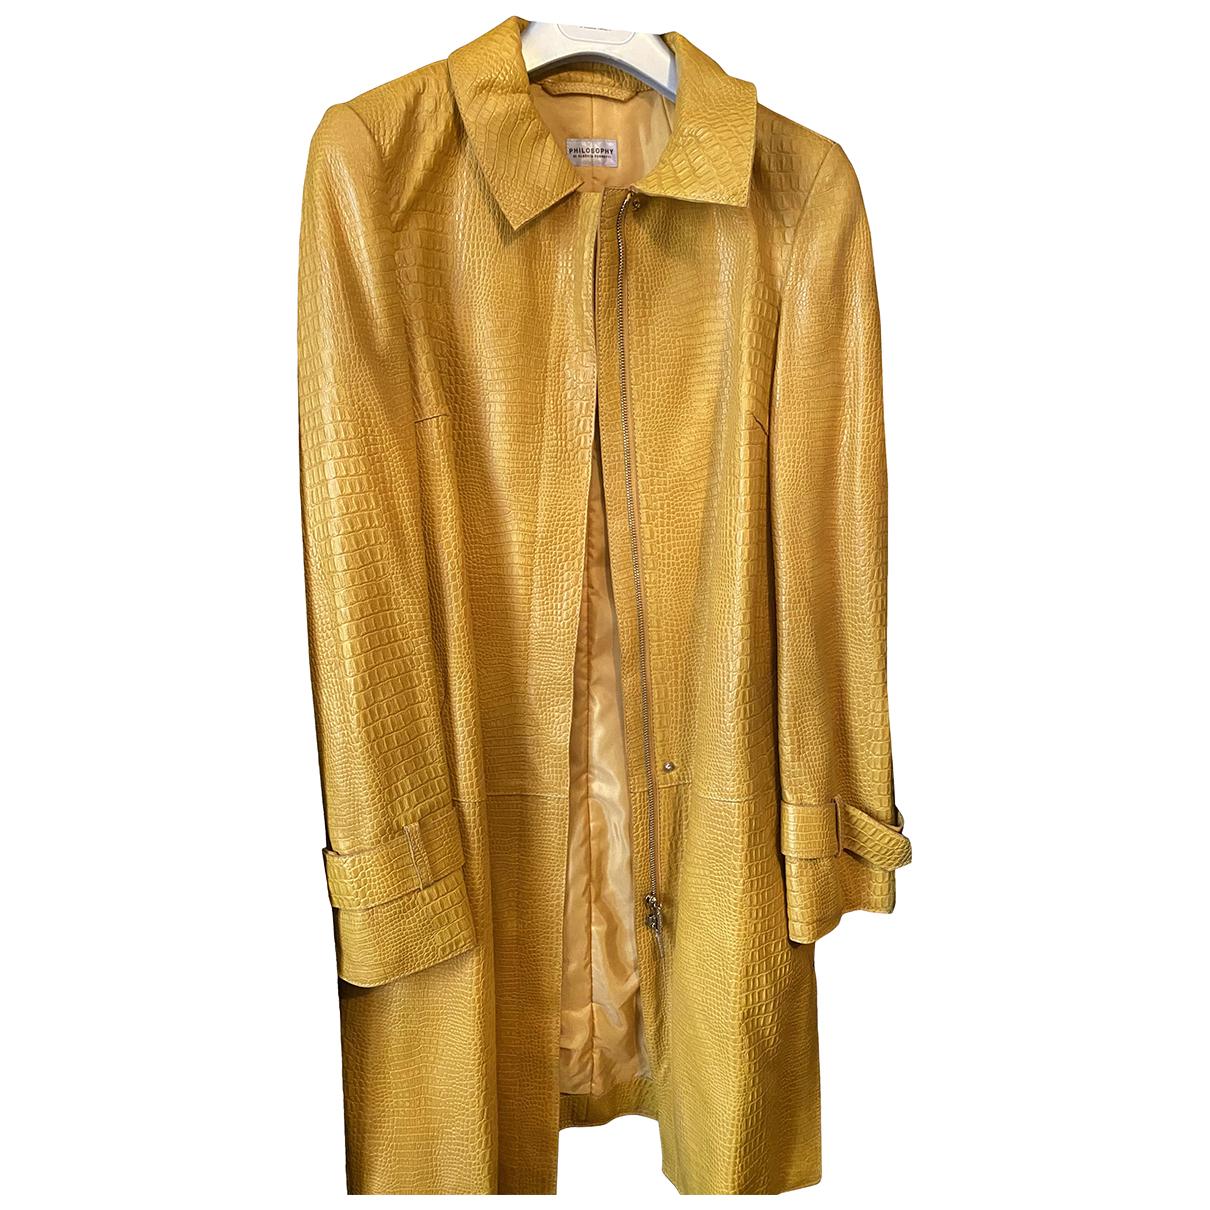 Alberta Ferretti - Manteau   pour femme en cuir - jaune